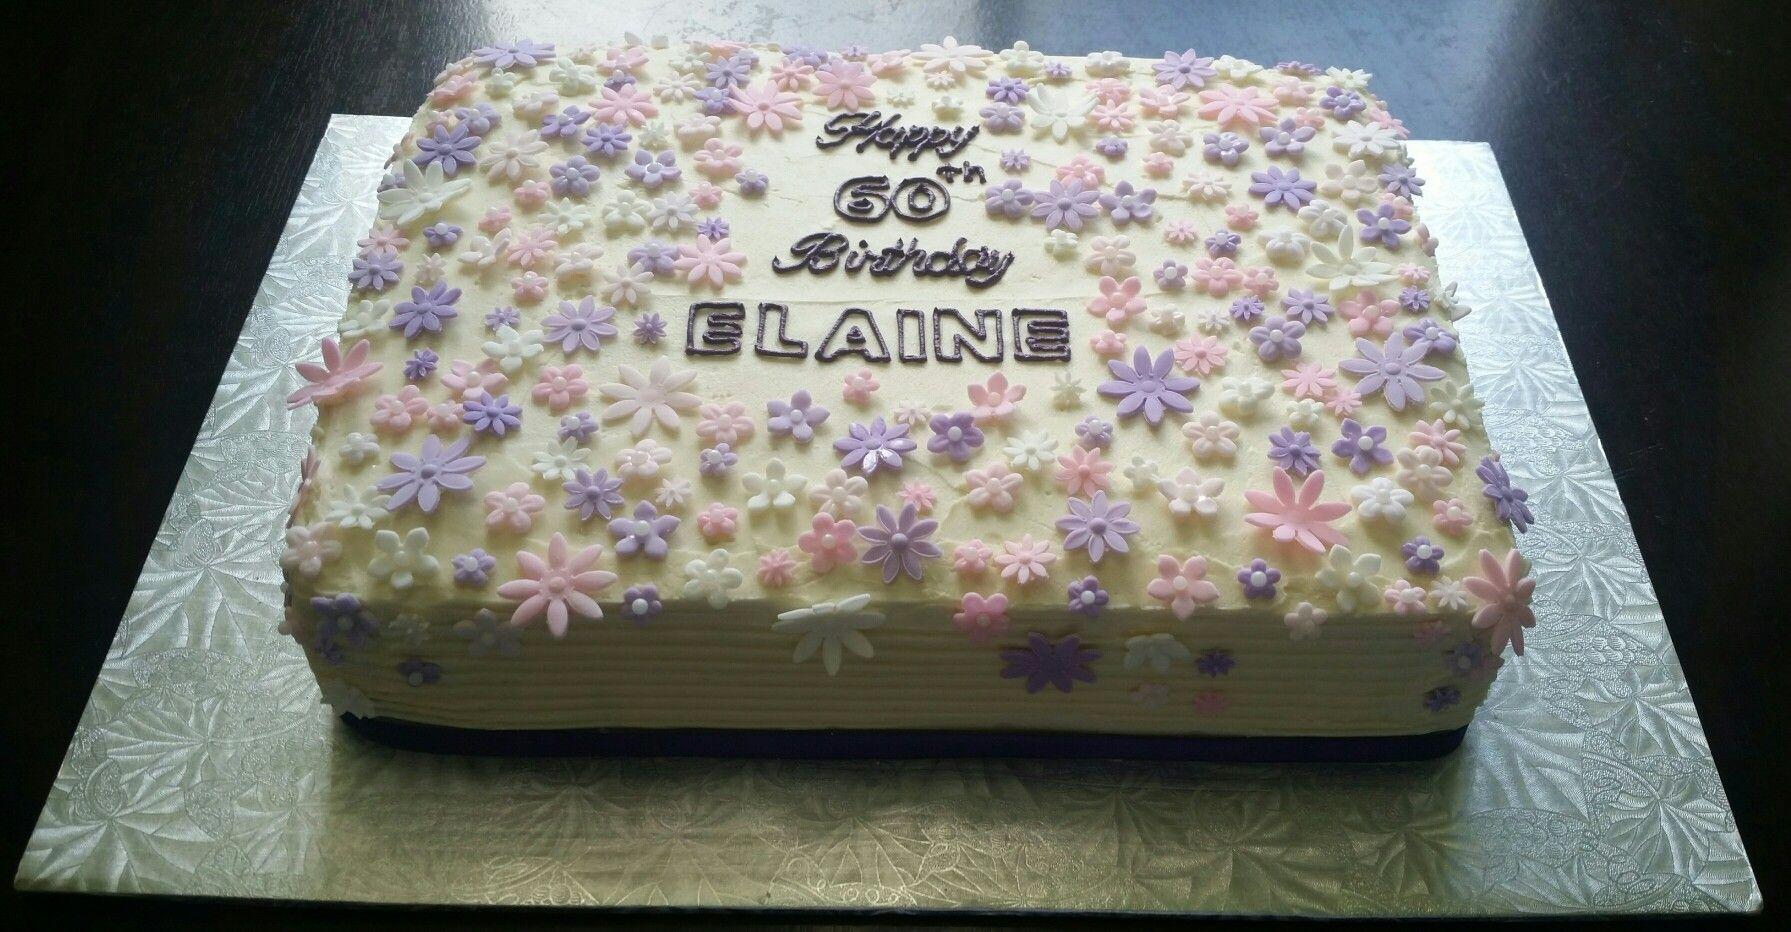 60th birthday slab cake with fondant flowers